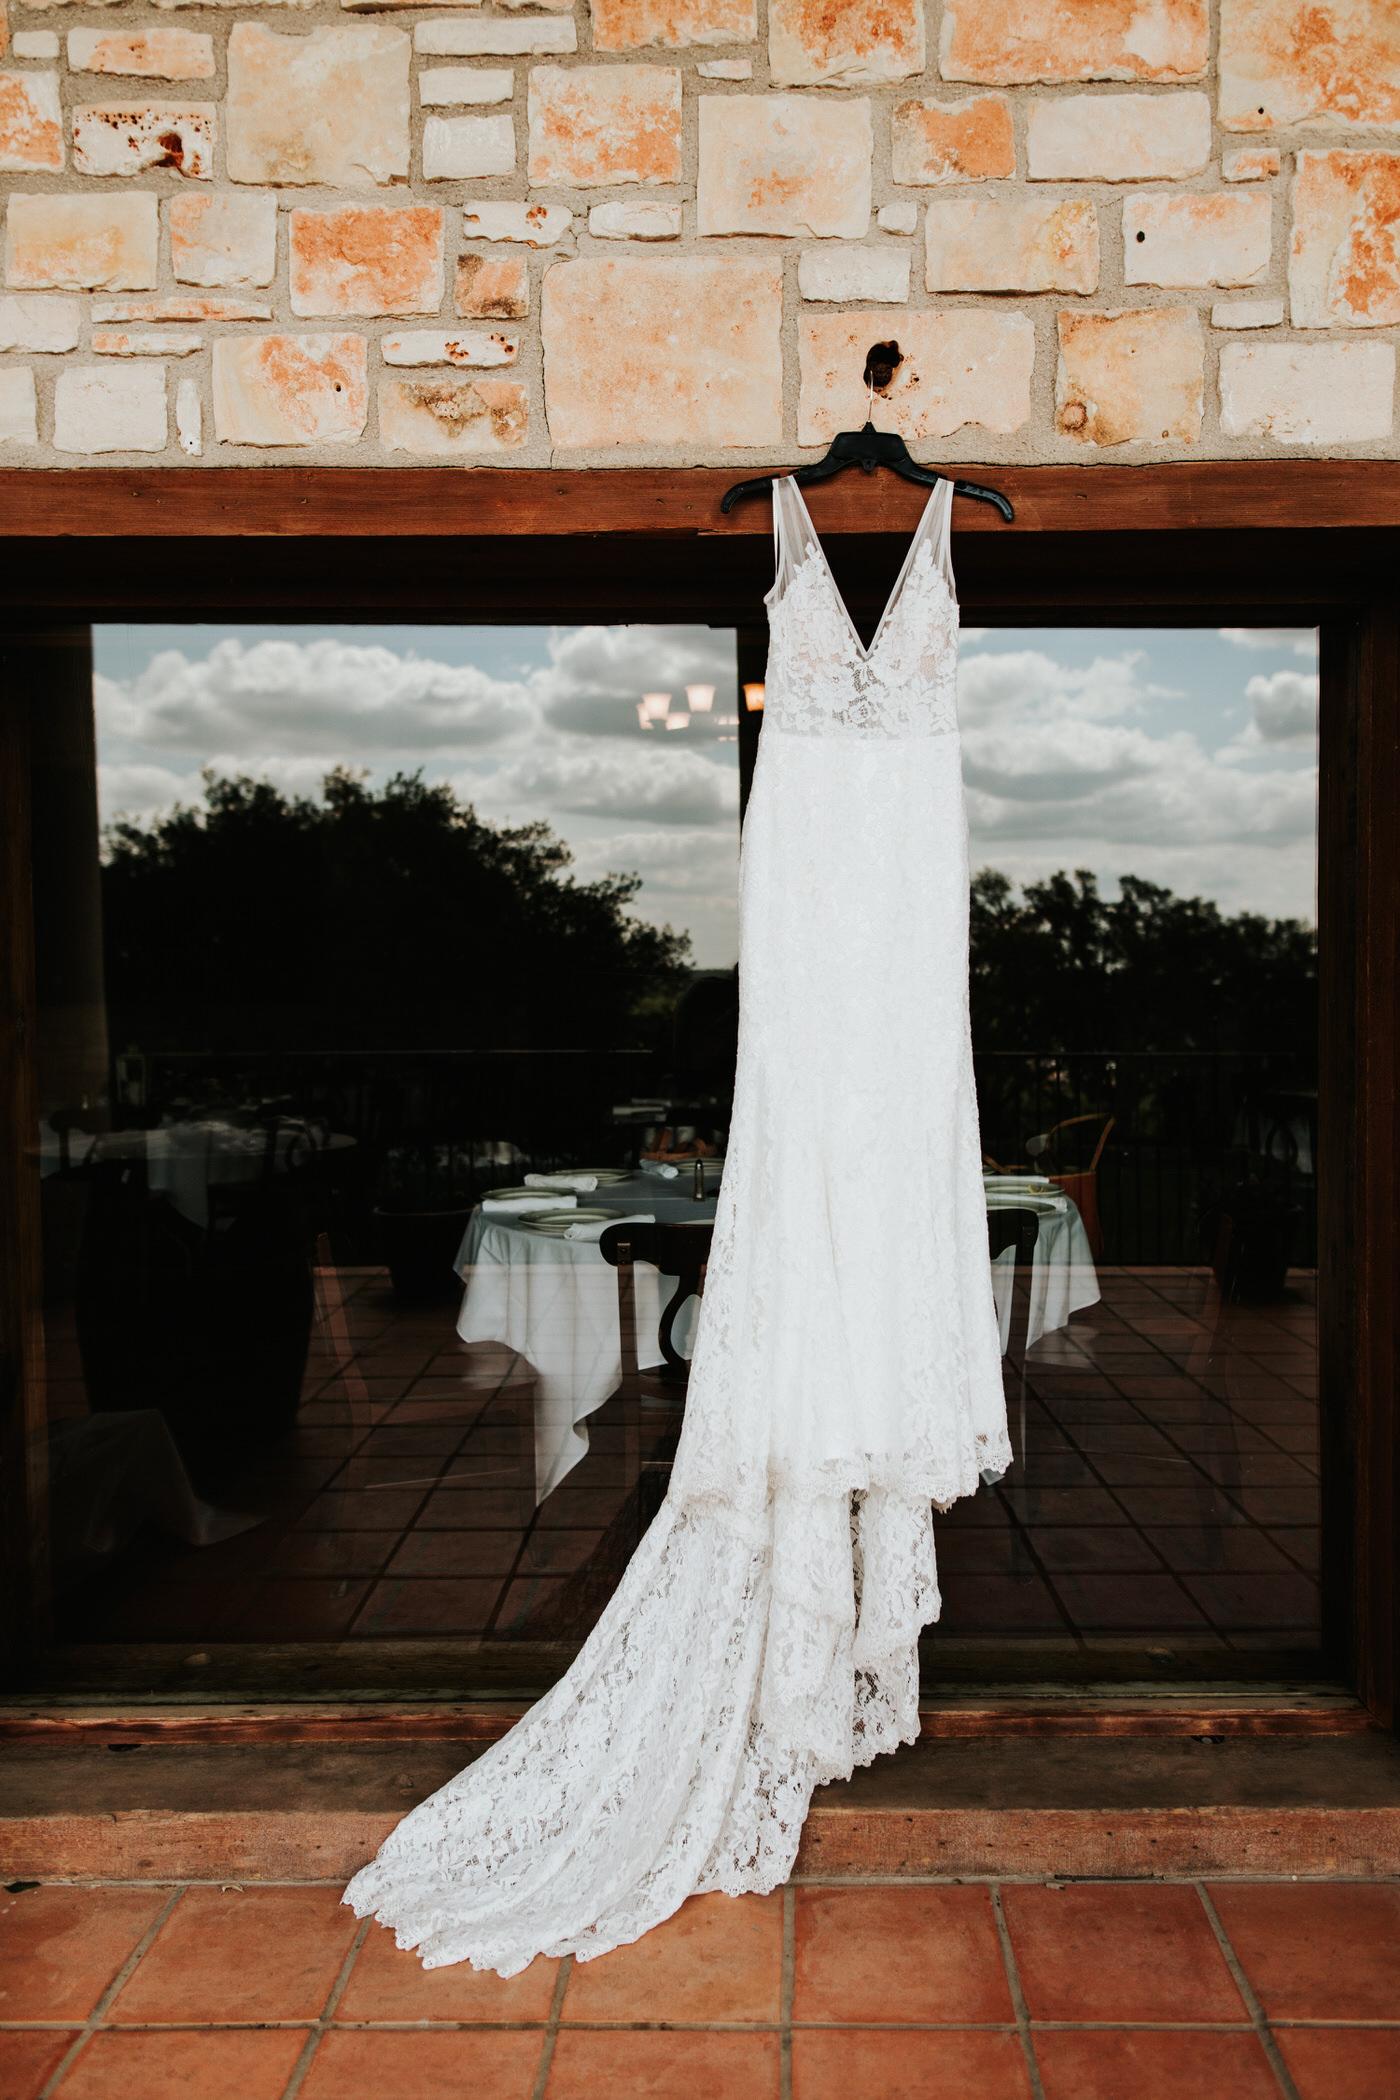 Thurman's Mansion wedding stationary